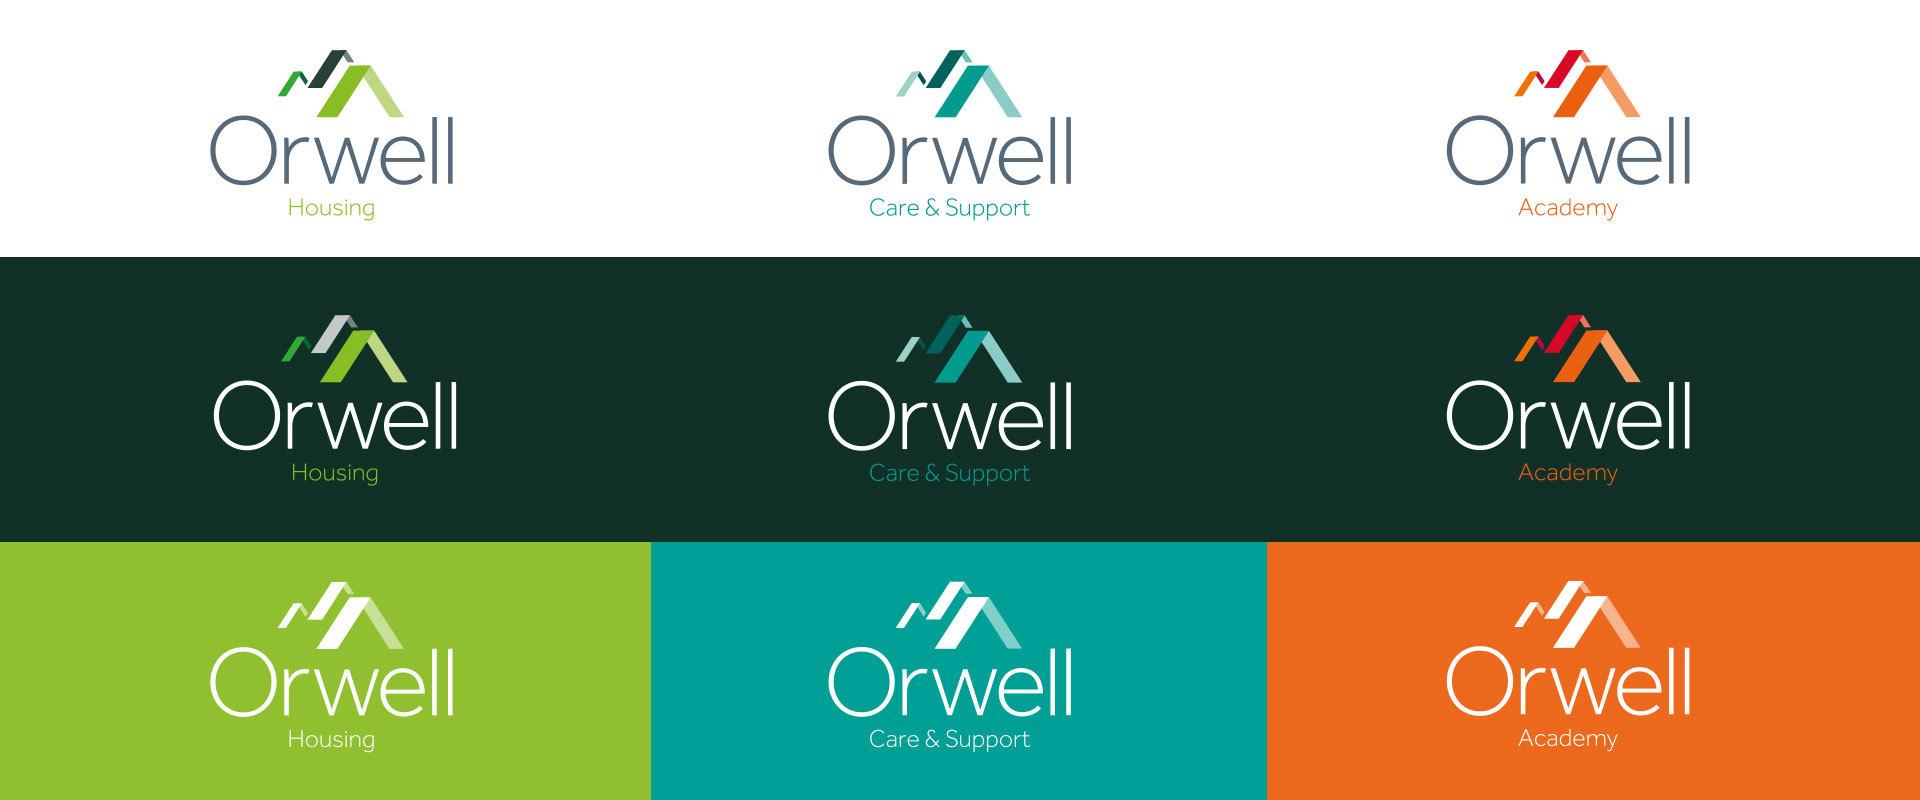 Orwell Housing